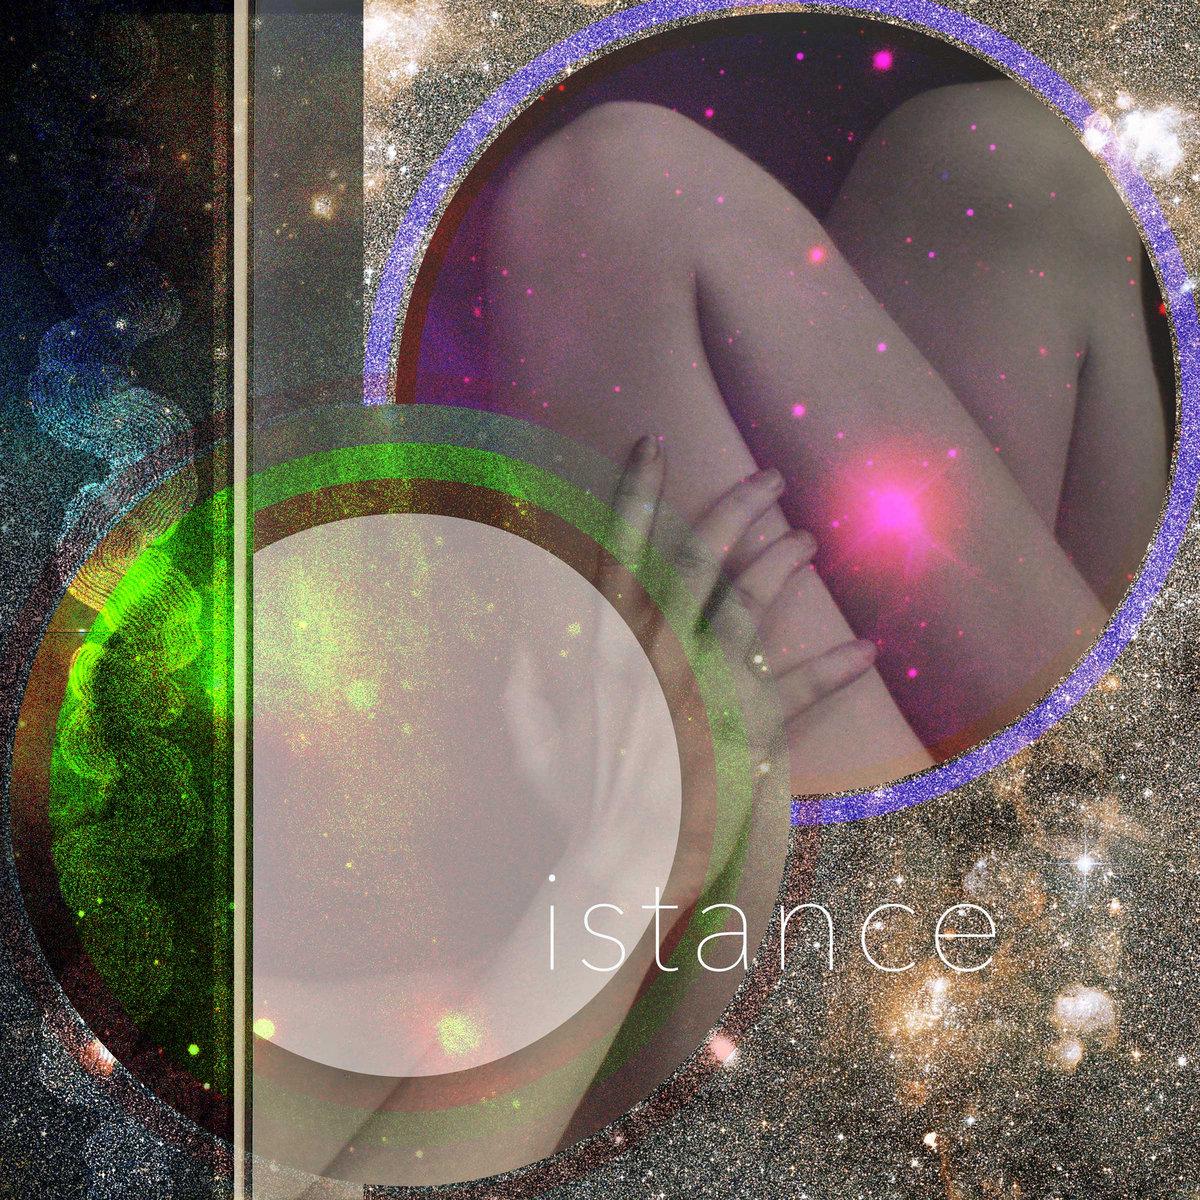 Distance (DreamDada) by DreamDada